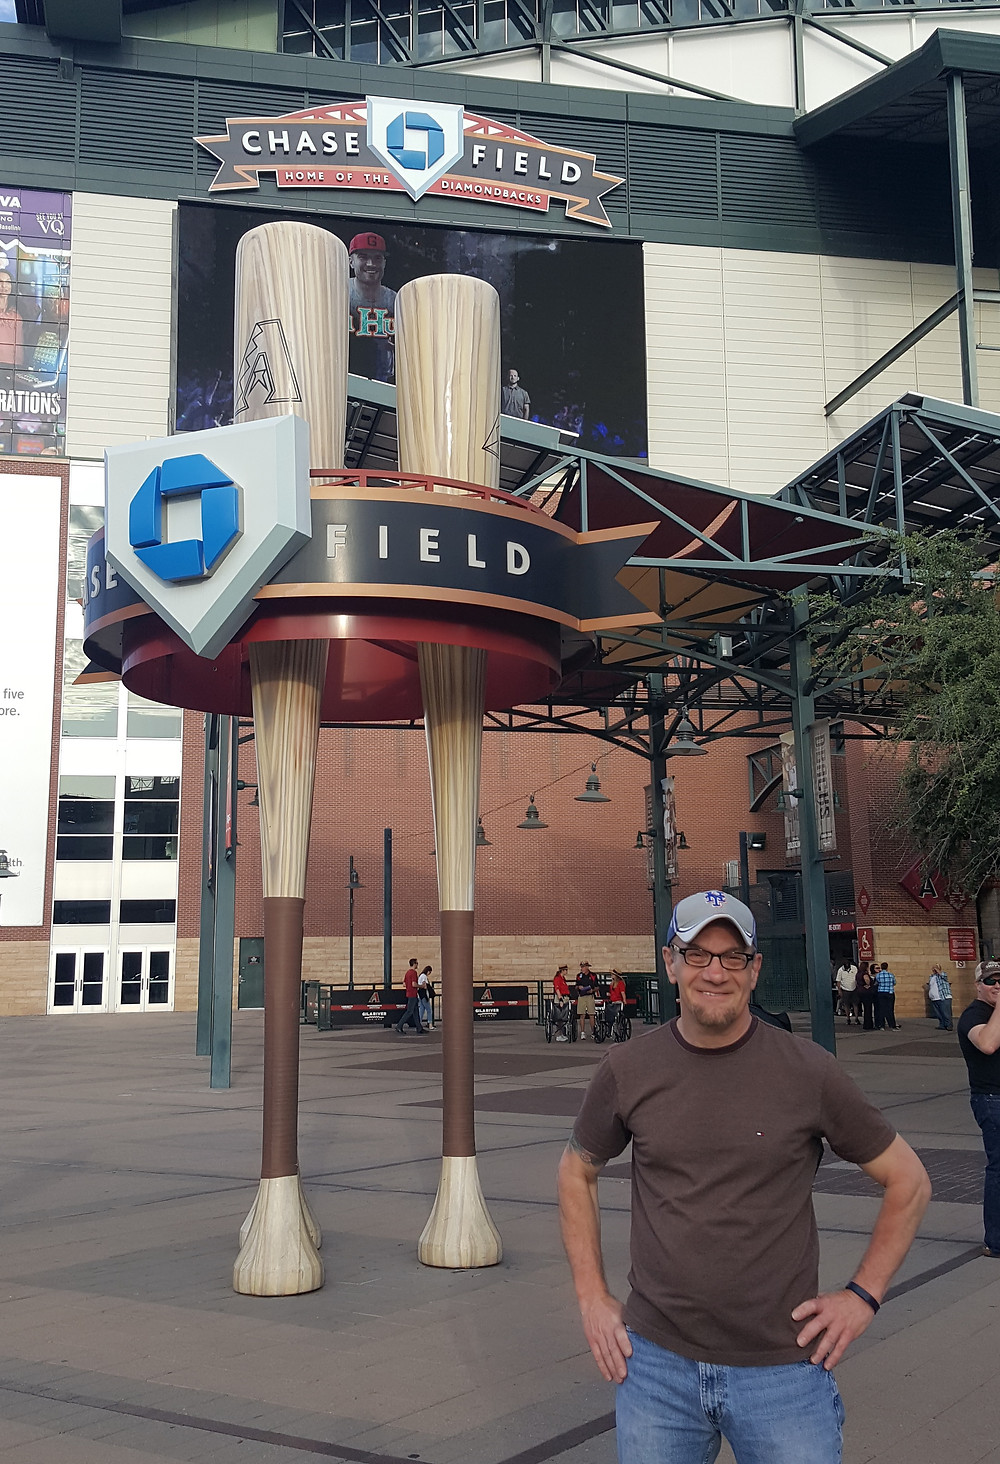 Stadium Review - Chase Field - Phoenix